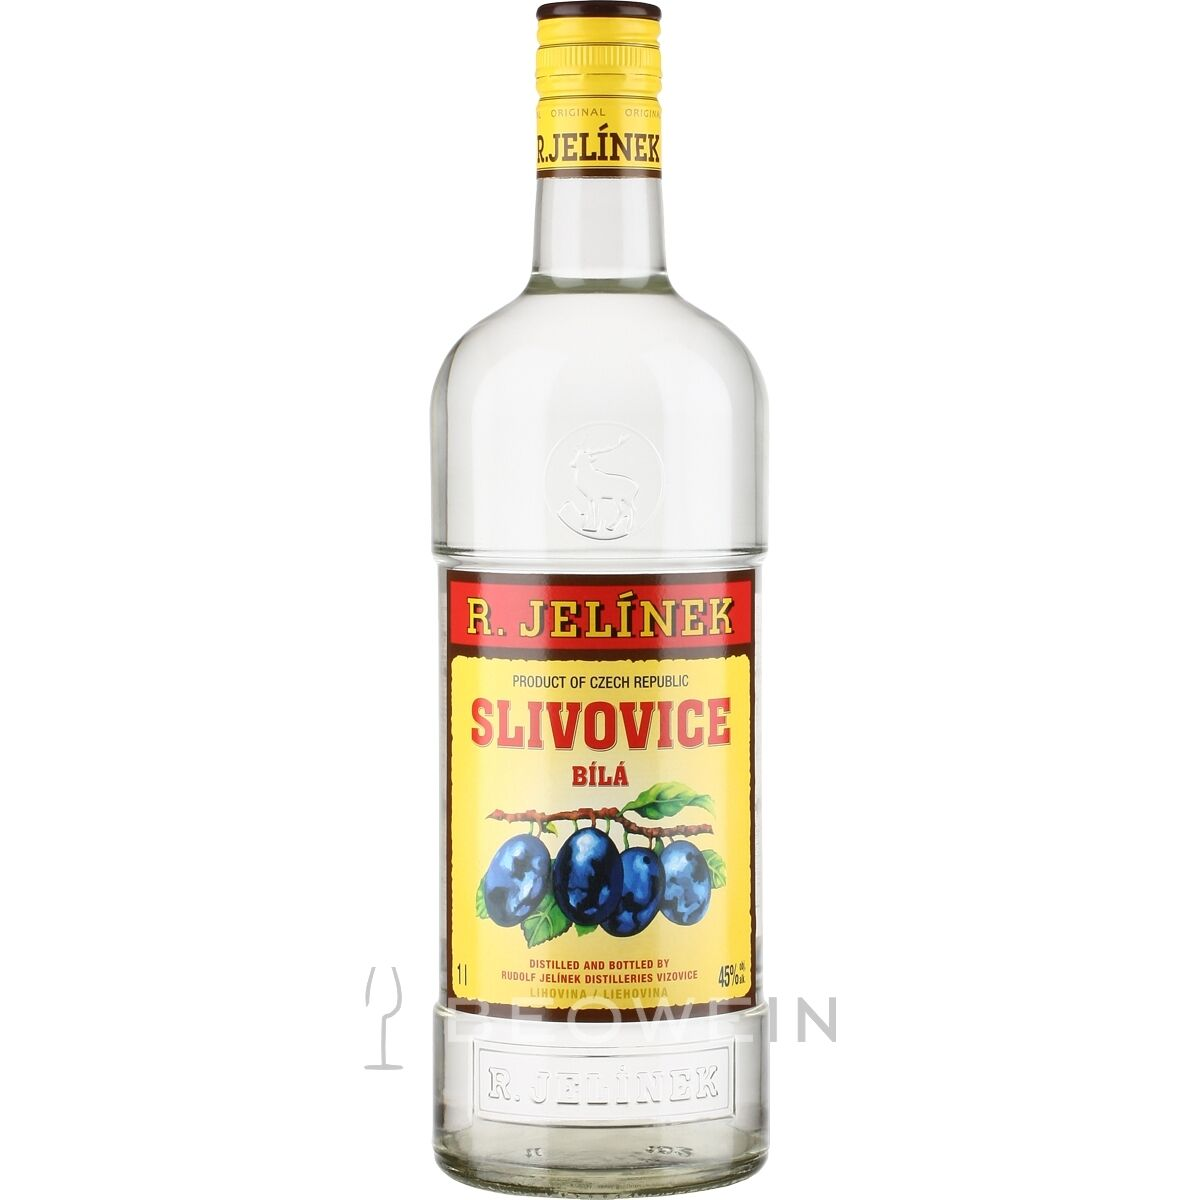 Jelinek Slivovitz 1,0 l Tschechischer Pflaumenbrand 45%vol Obstler Zwetschge